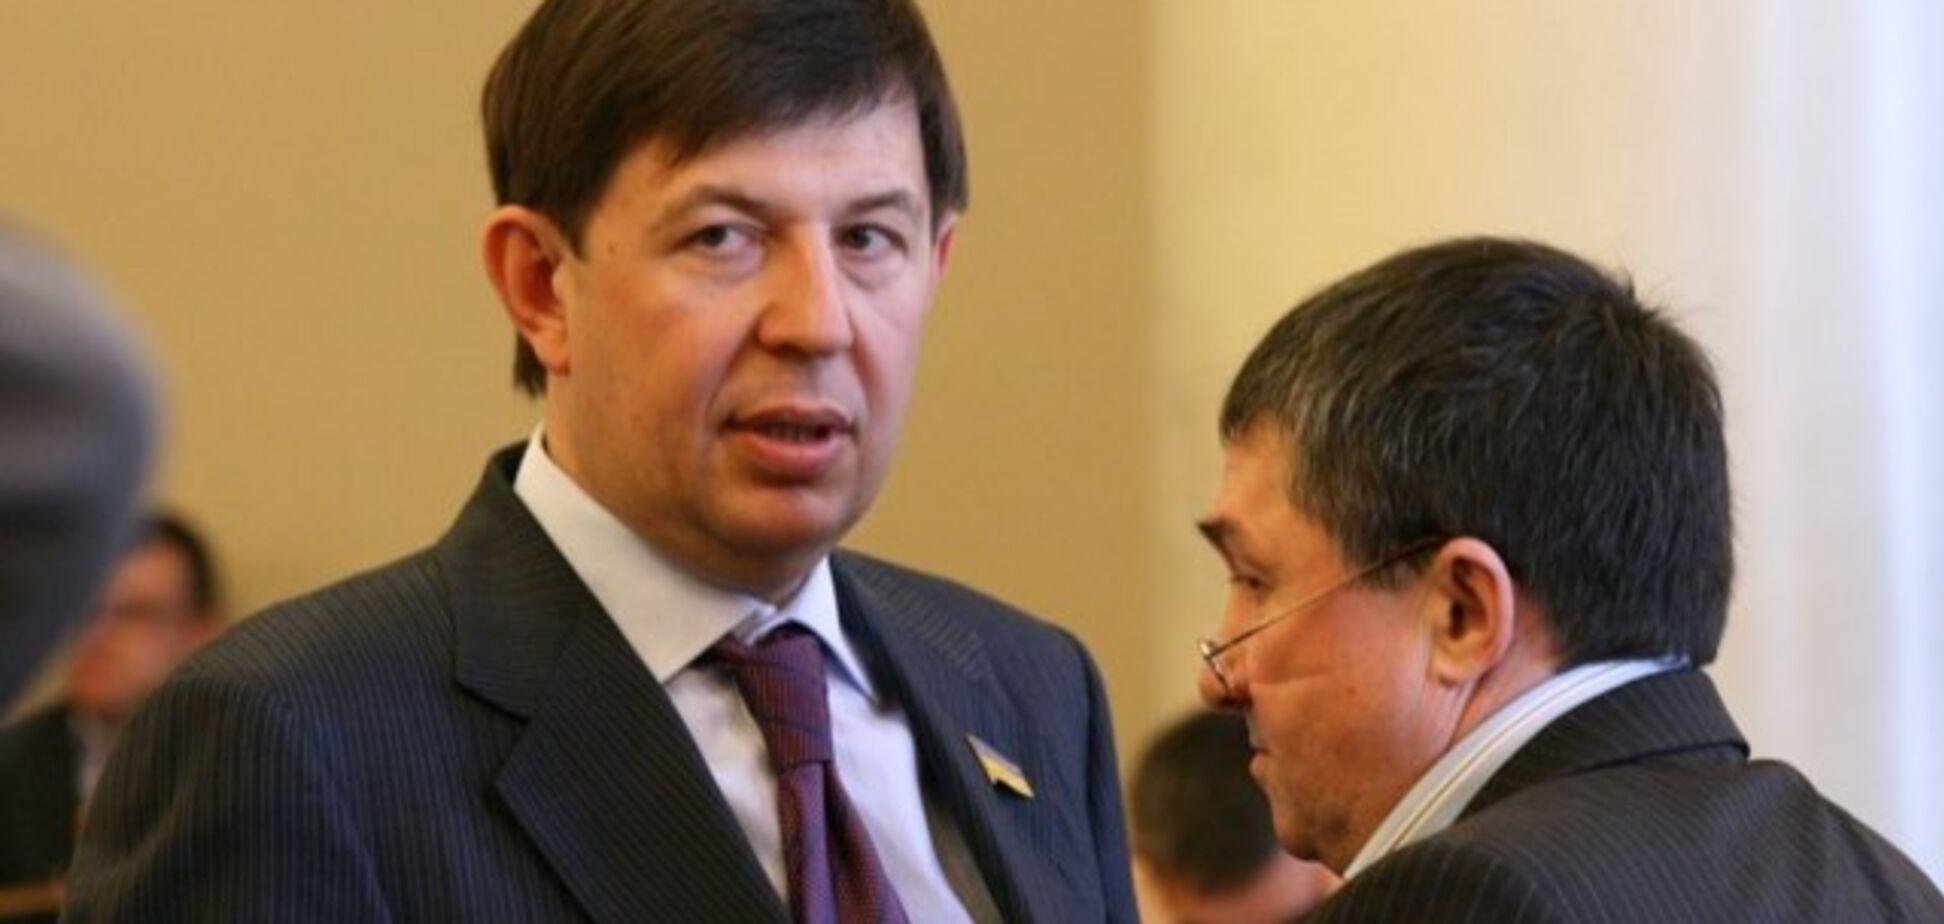 Суд арештував майно поплічника Медведчука нардепа Козака